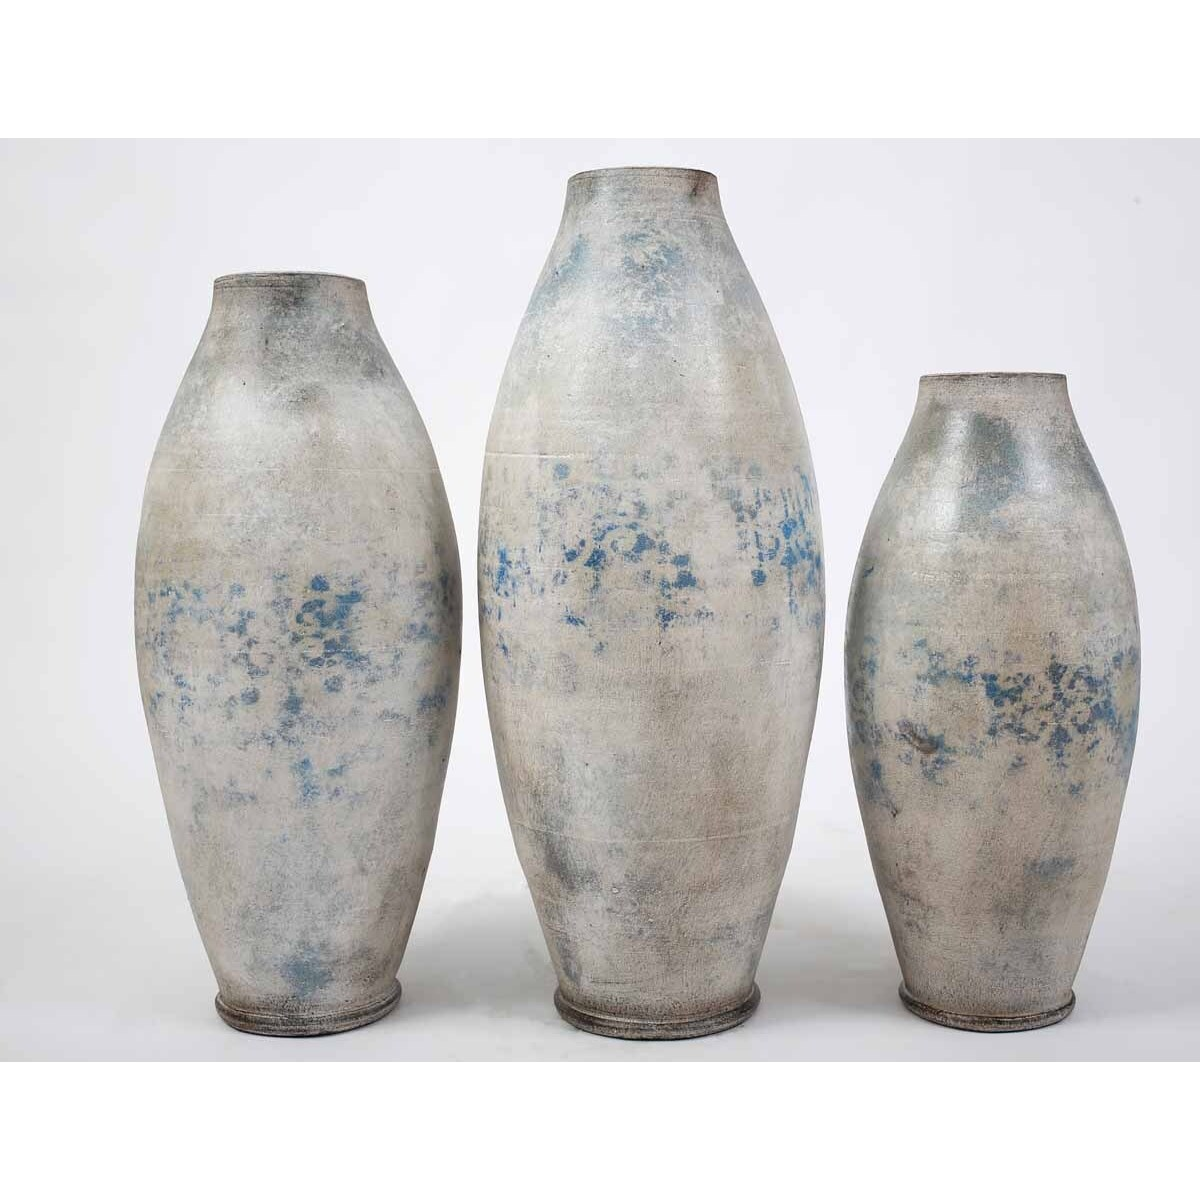 Set of 3 Floor Jars in Tradewind Finish